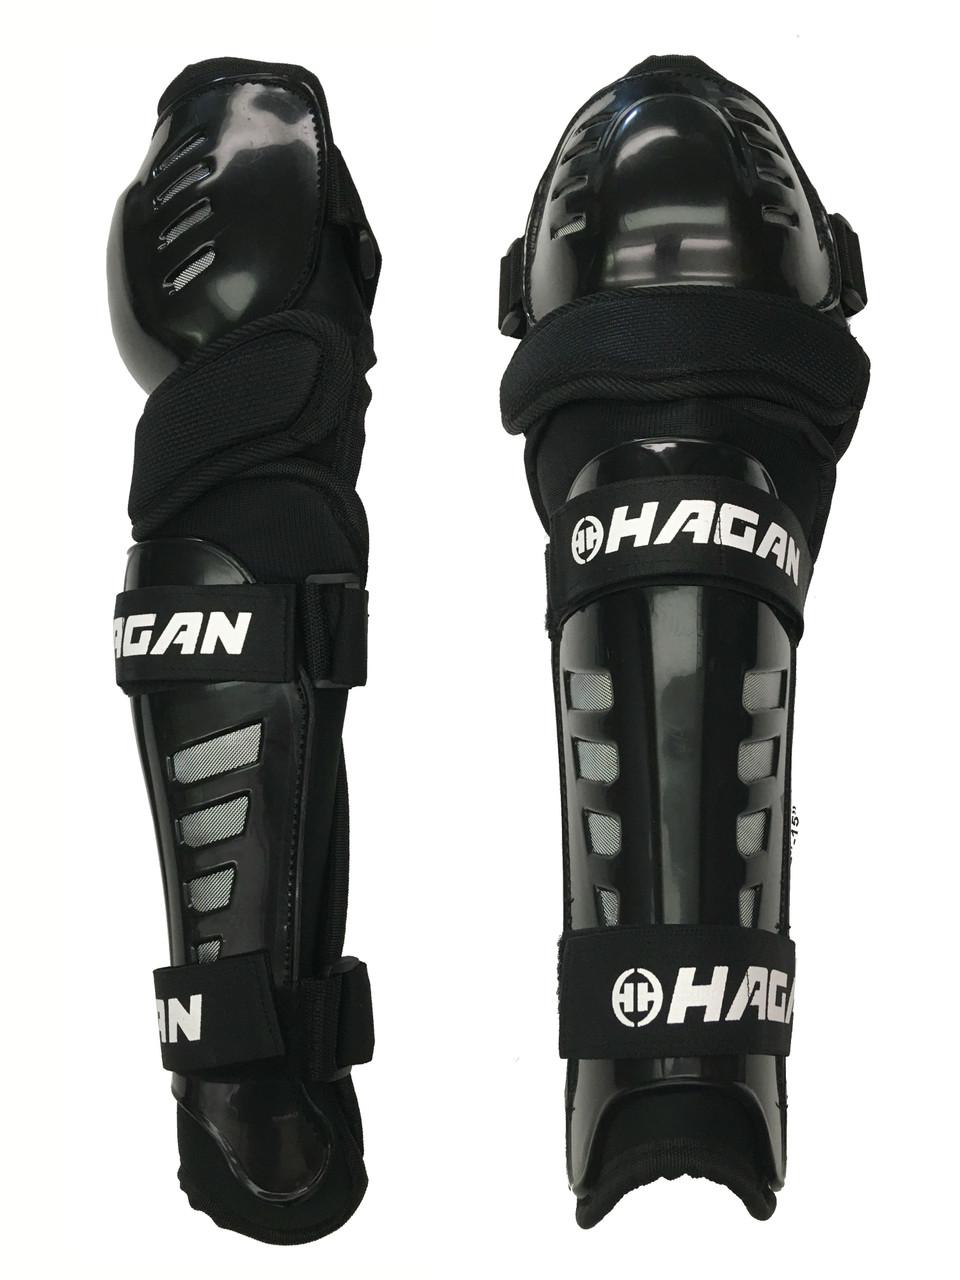 H 5 Hagan Hockey Shin Pads